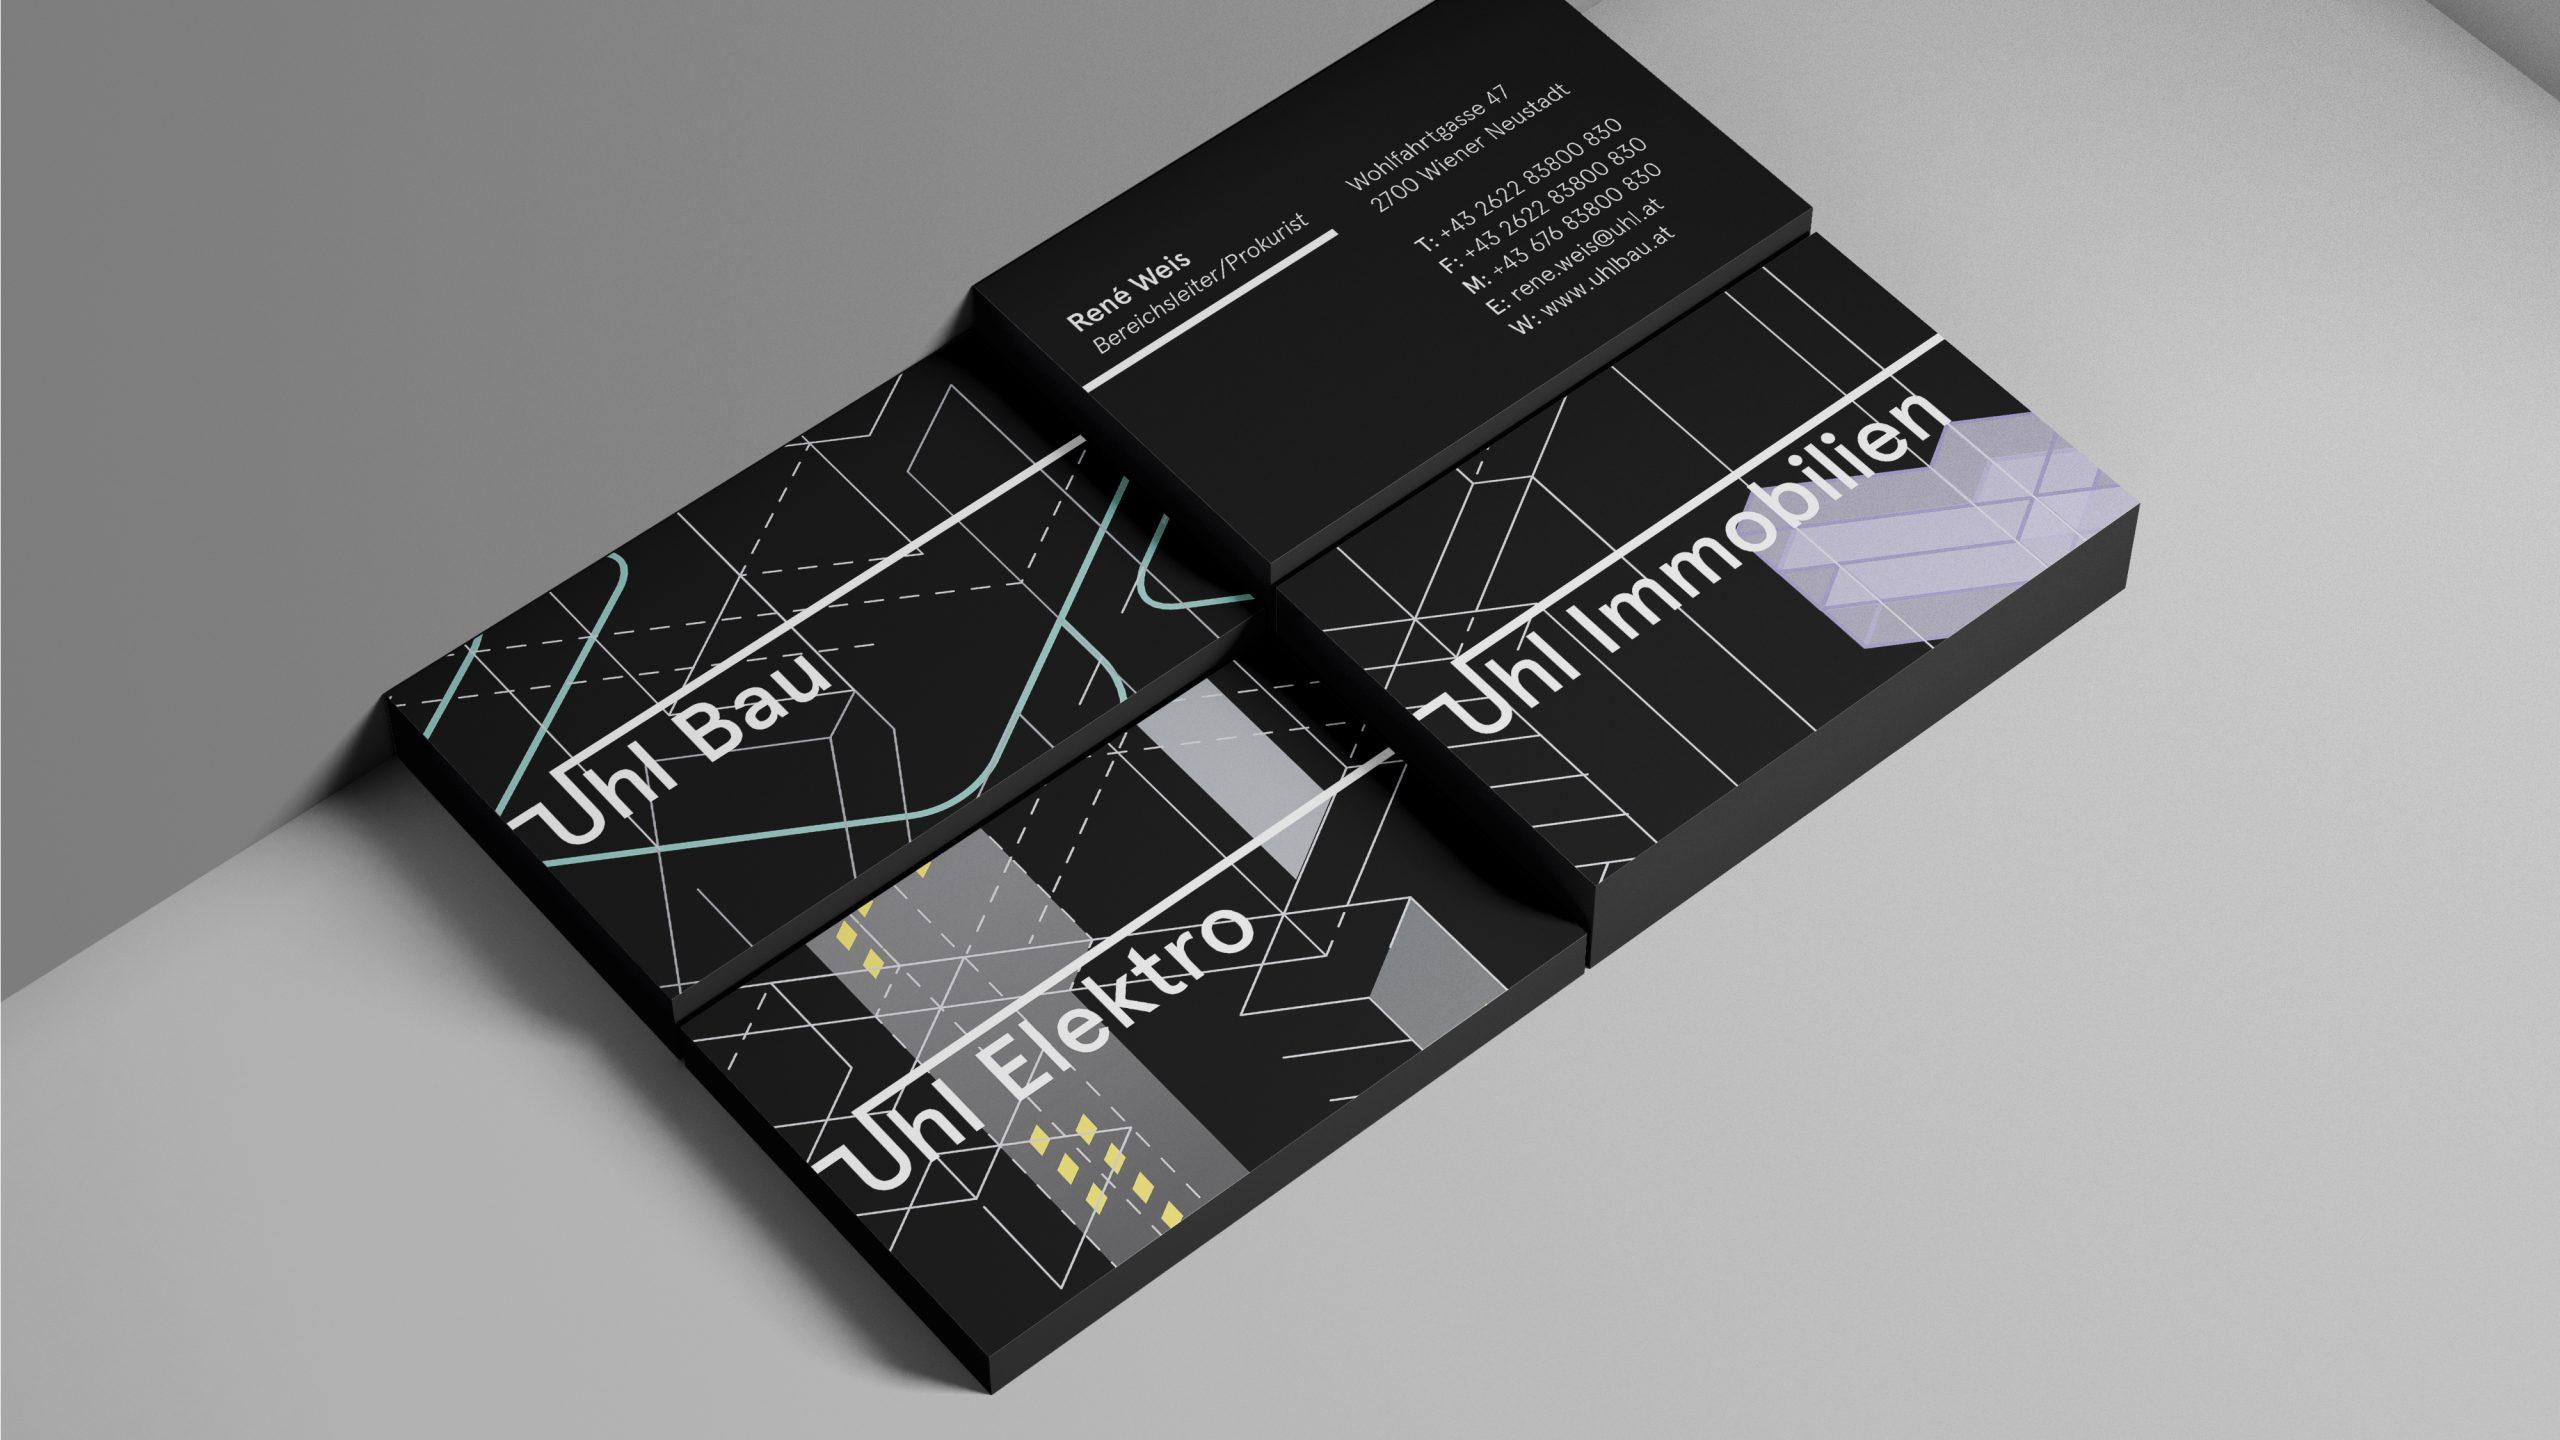 3 Stella Butz Stefan Kinateder Uhl Corporate Design Business Card